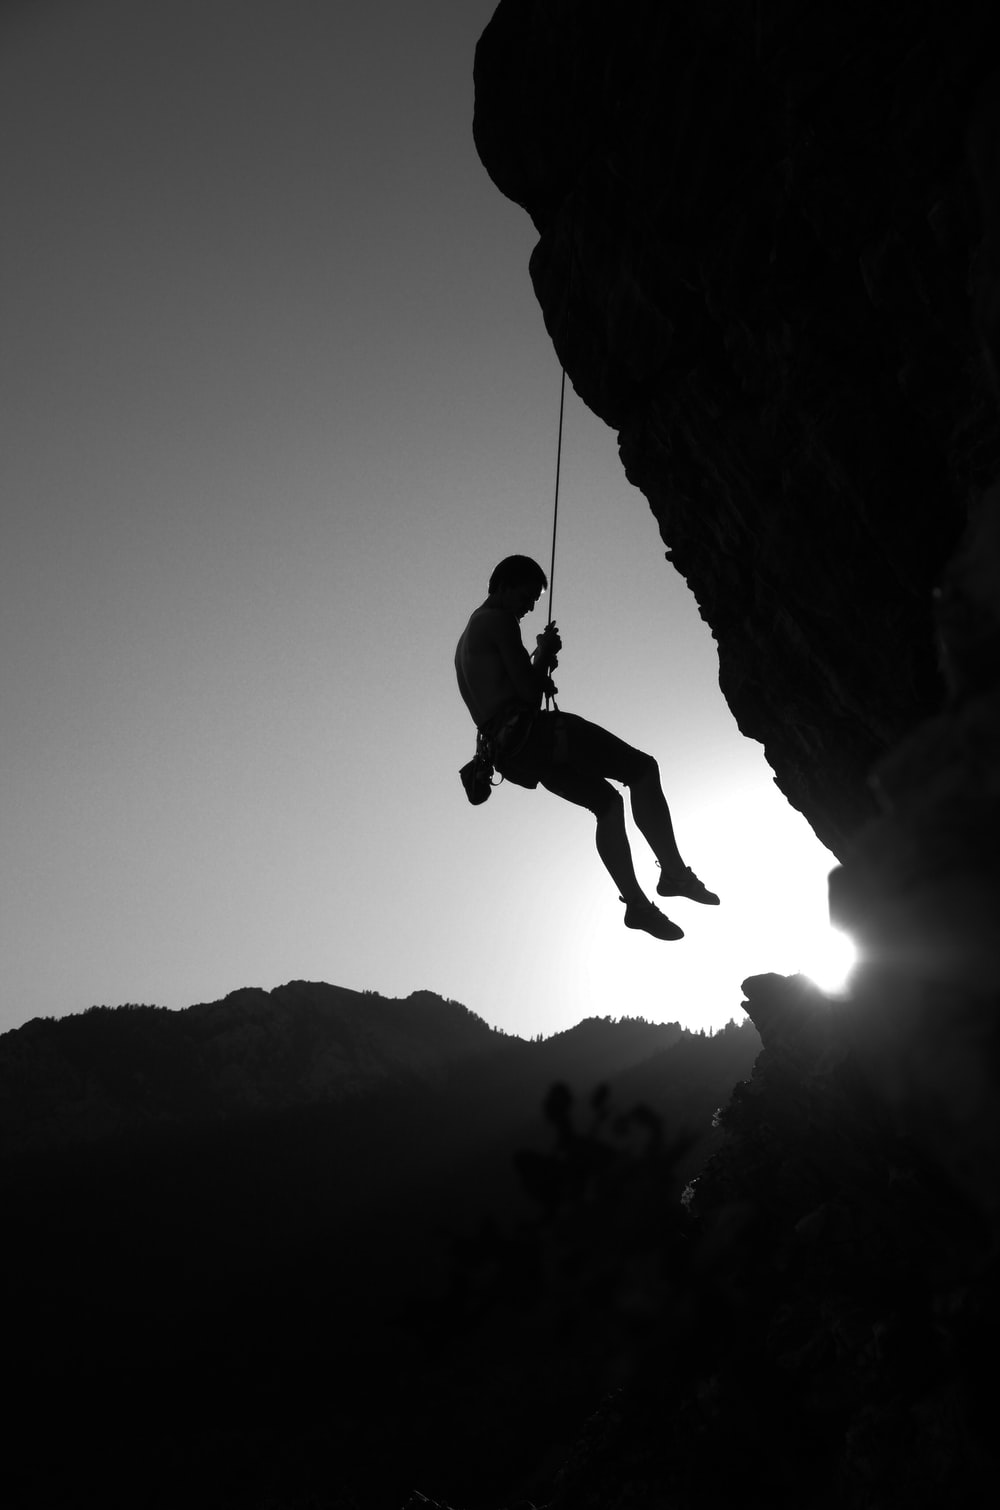 man hanging on cliff